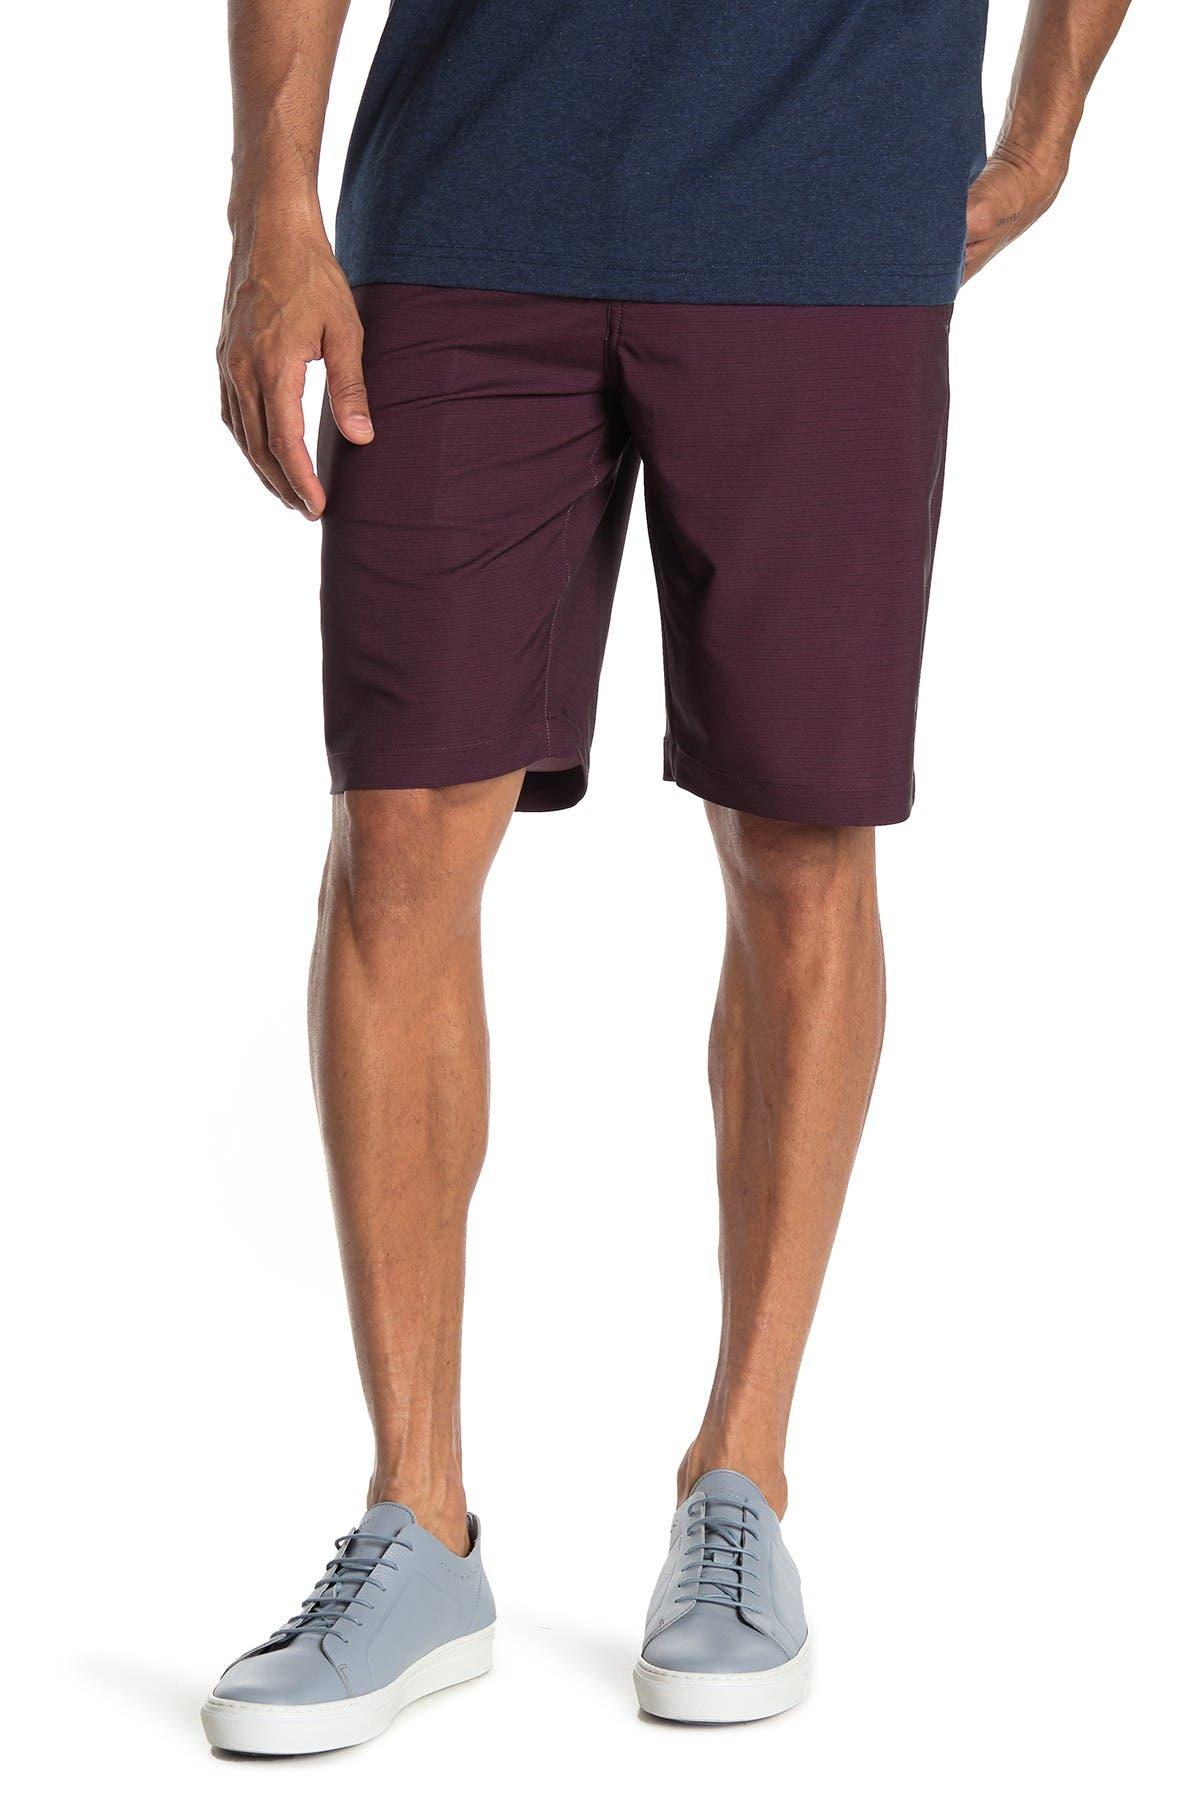 Image of TRAVIS MATHEW Loreto Stripe Stretch Shorts